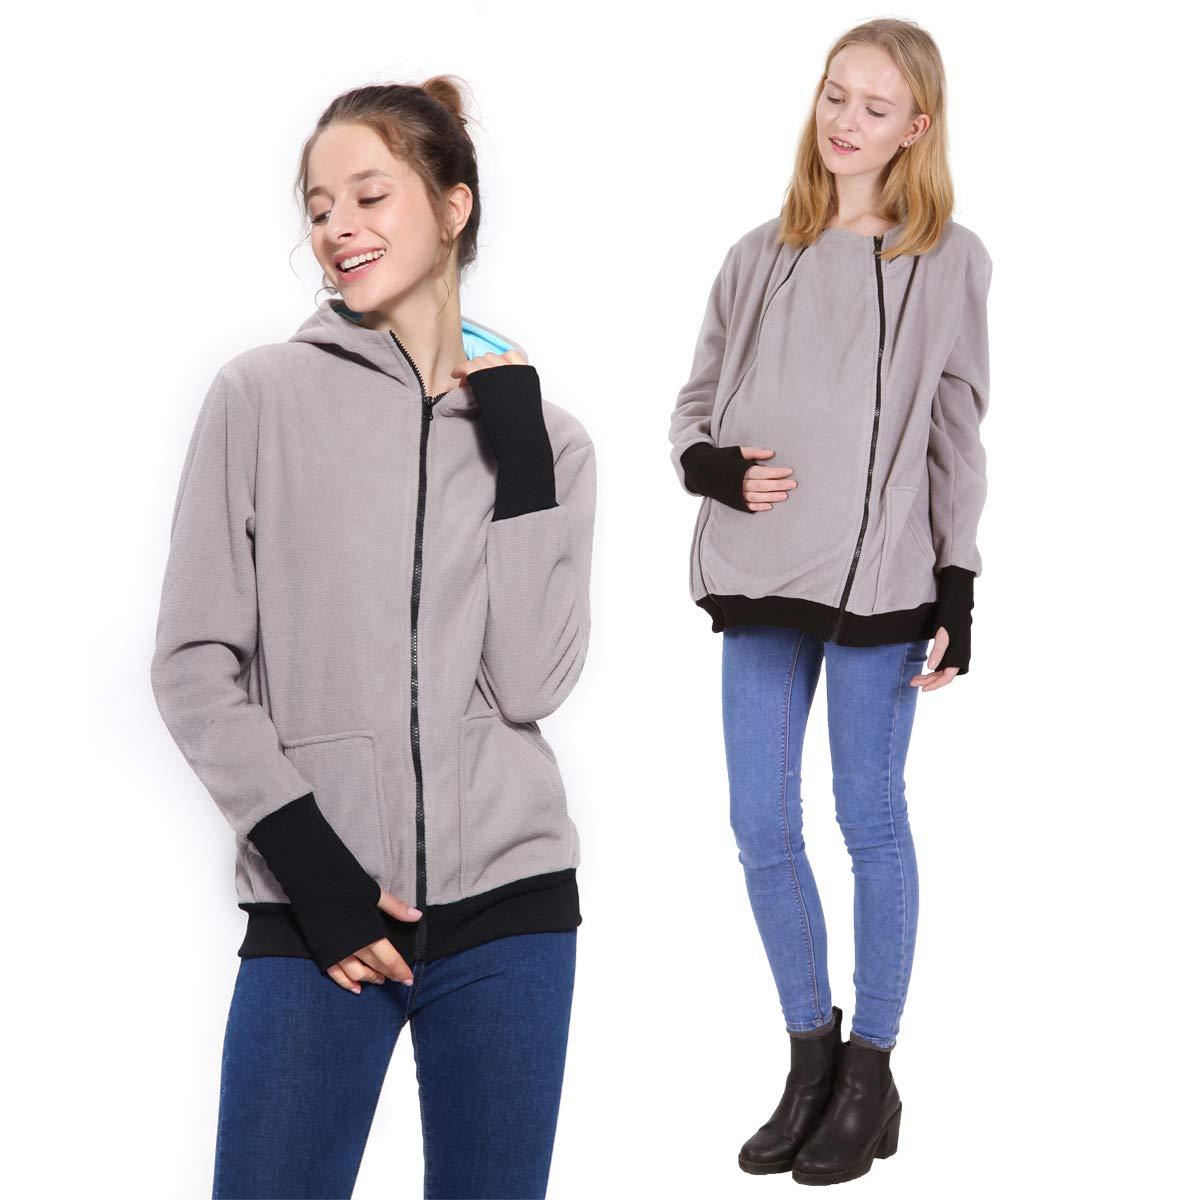 Womens Maternity Hoodie Polar Fleece Sweatshirt, 2 in1 Soft Zipper Up Jacket for Mom (Light Grey, 2XL/3XL)